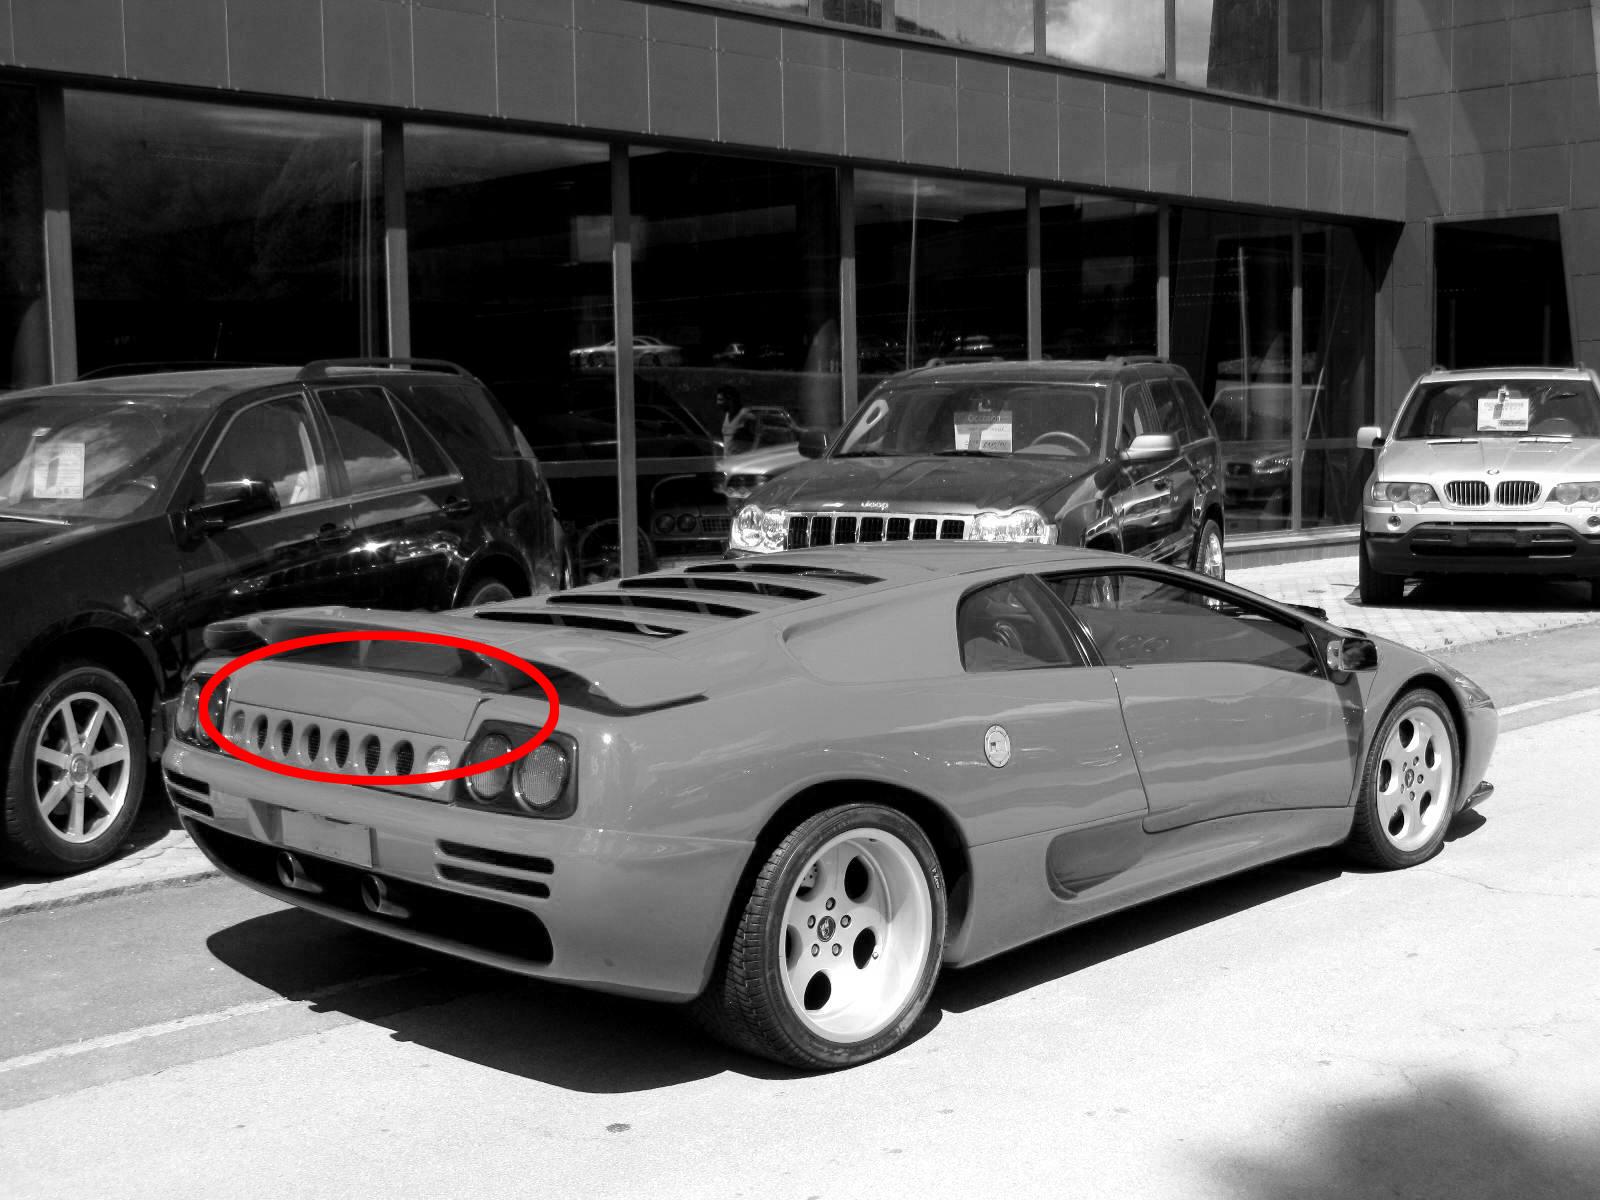 808002c317 Wonderful Lamborghini Countach Strohm De Rella Cars Trend